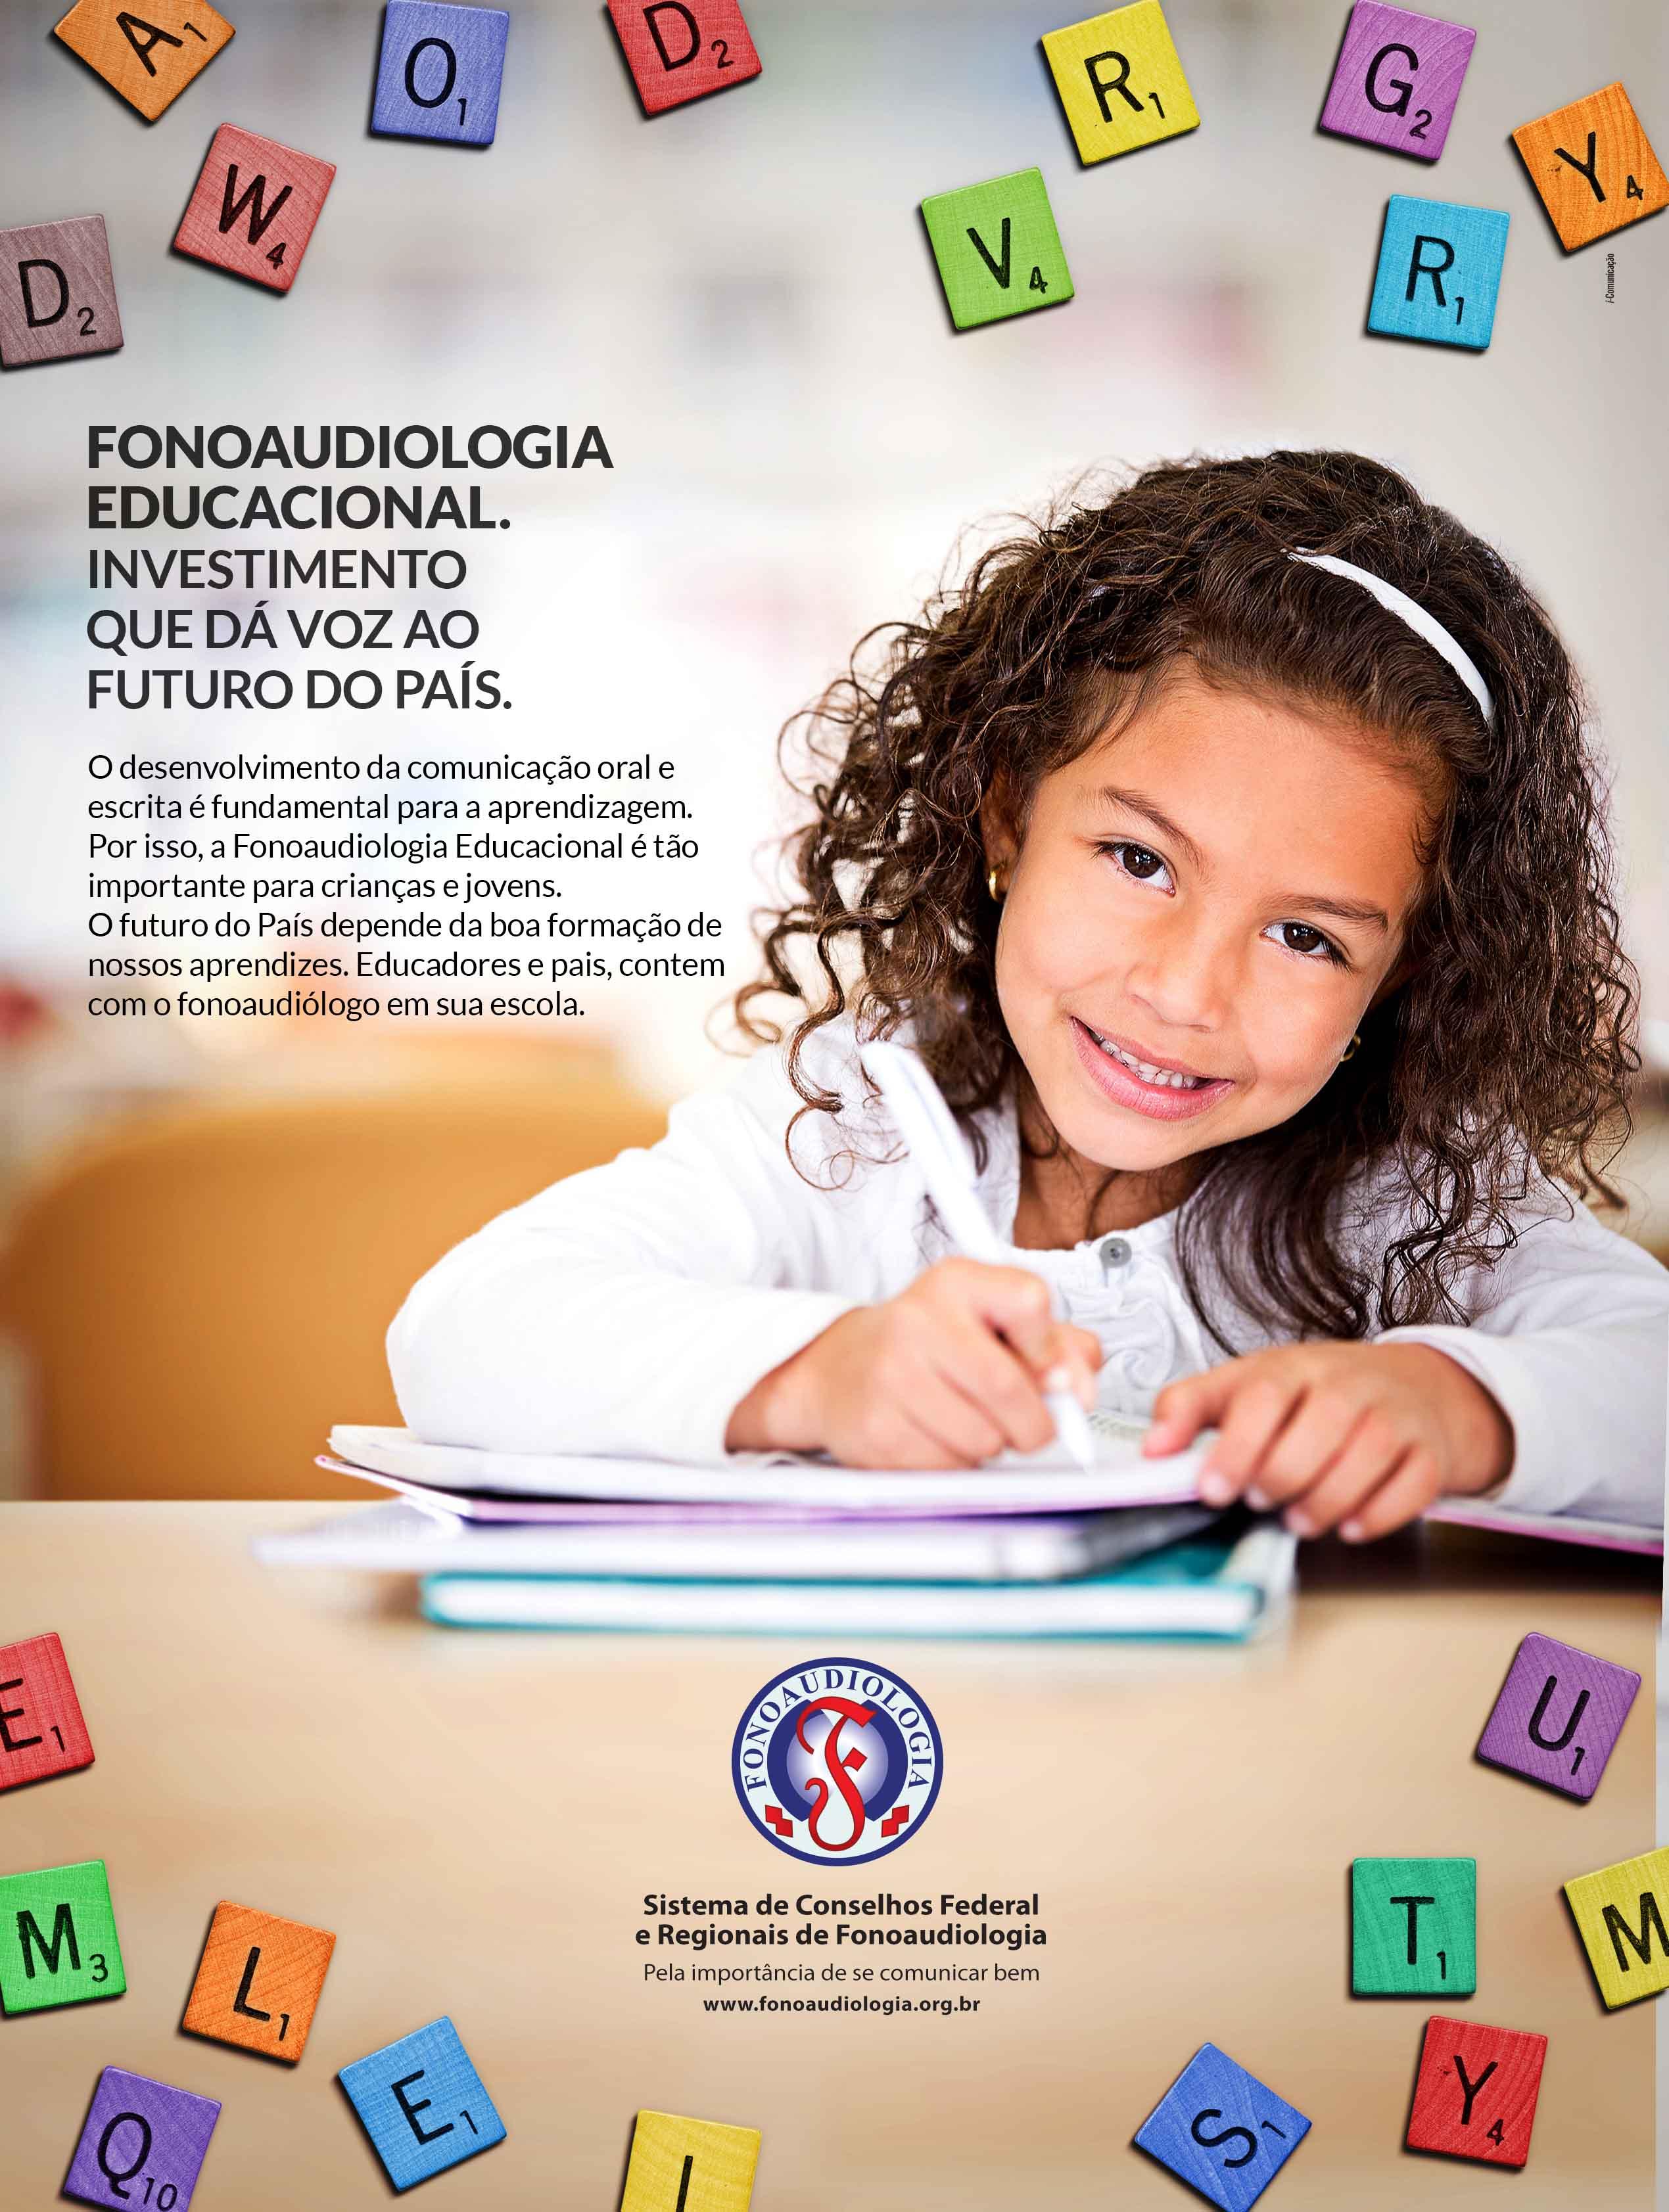 Campanha Fonoaudiologia Educacional 2013